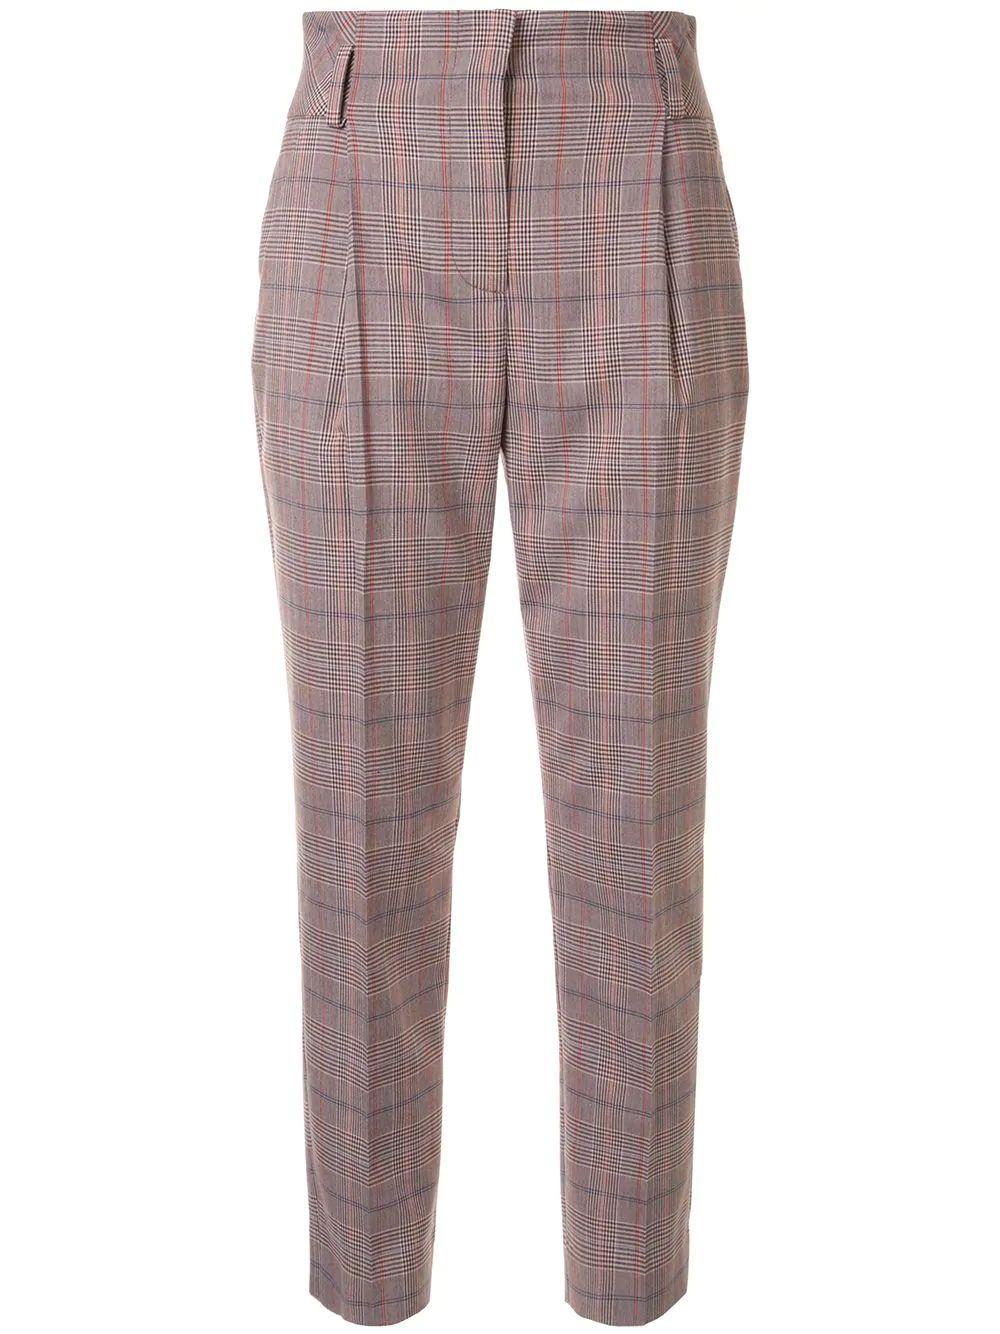 Plaid Trouser Item # S20101500